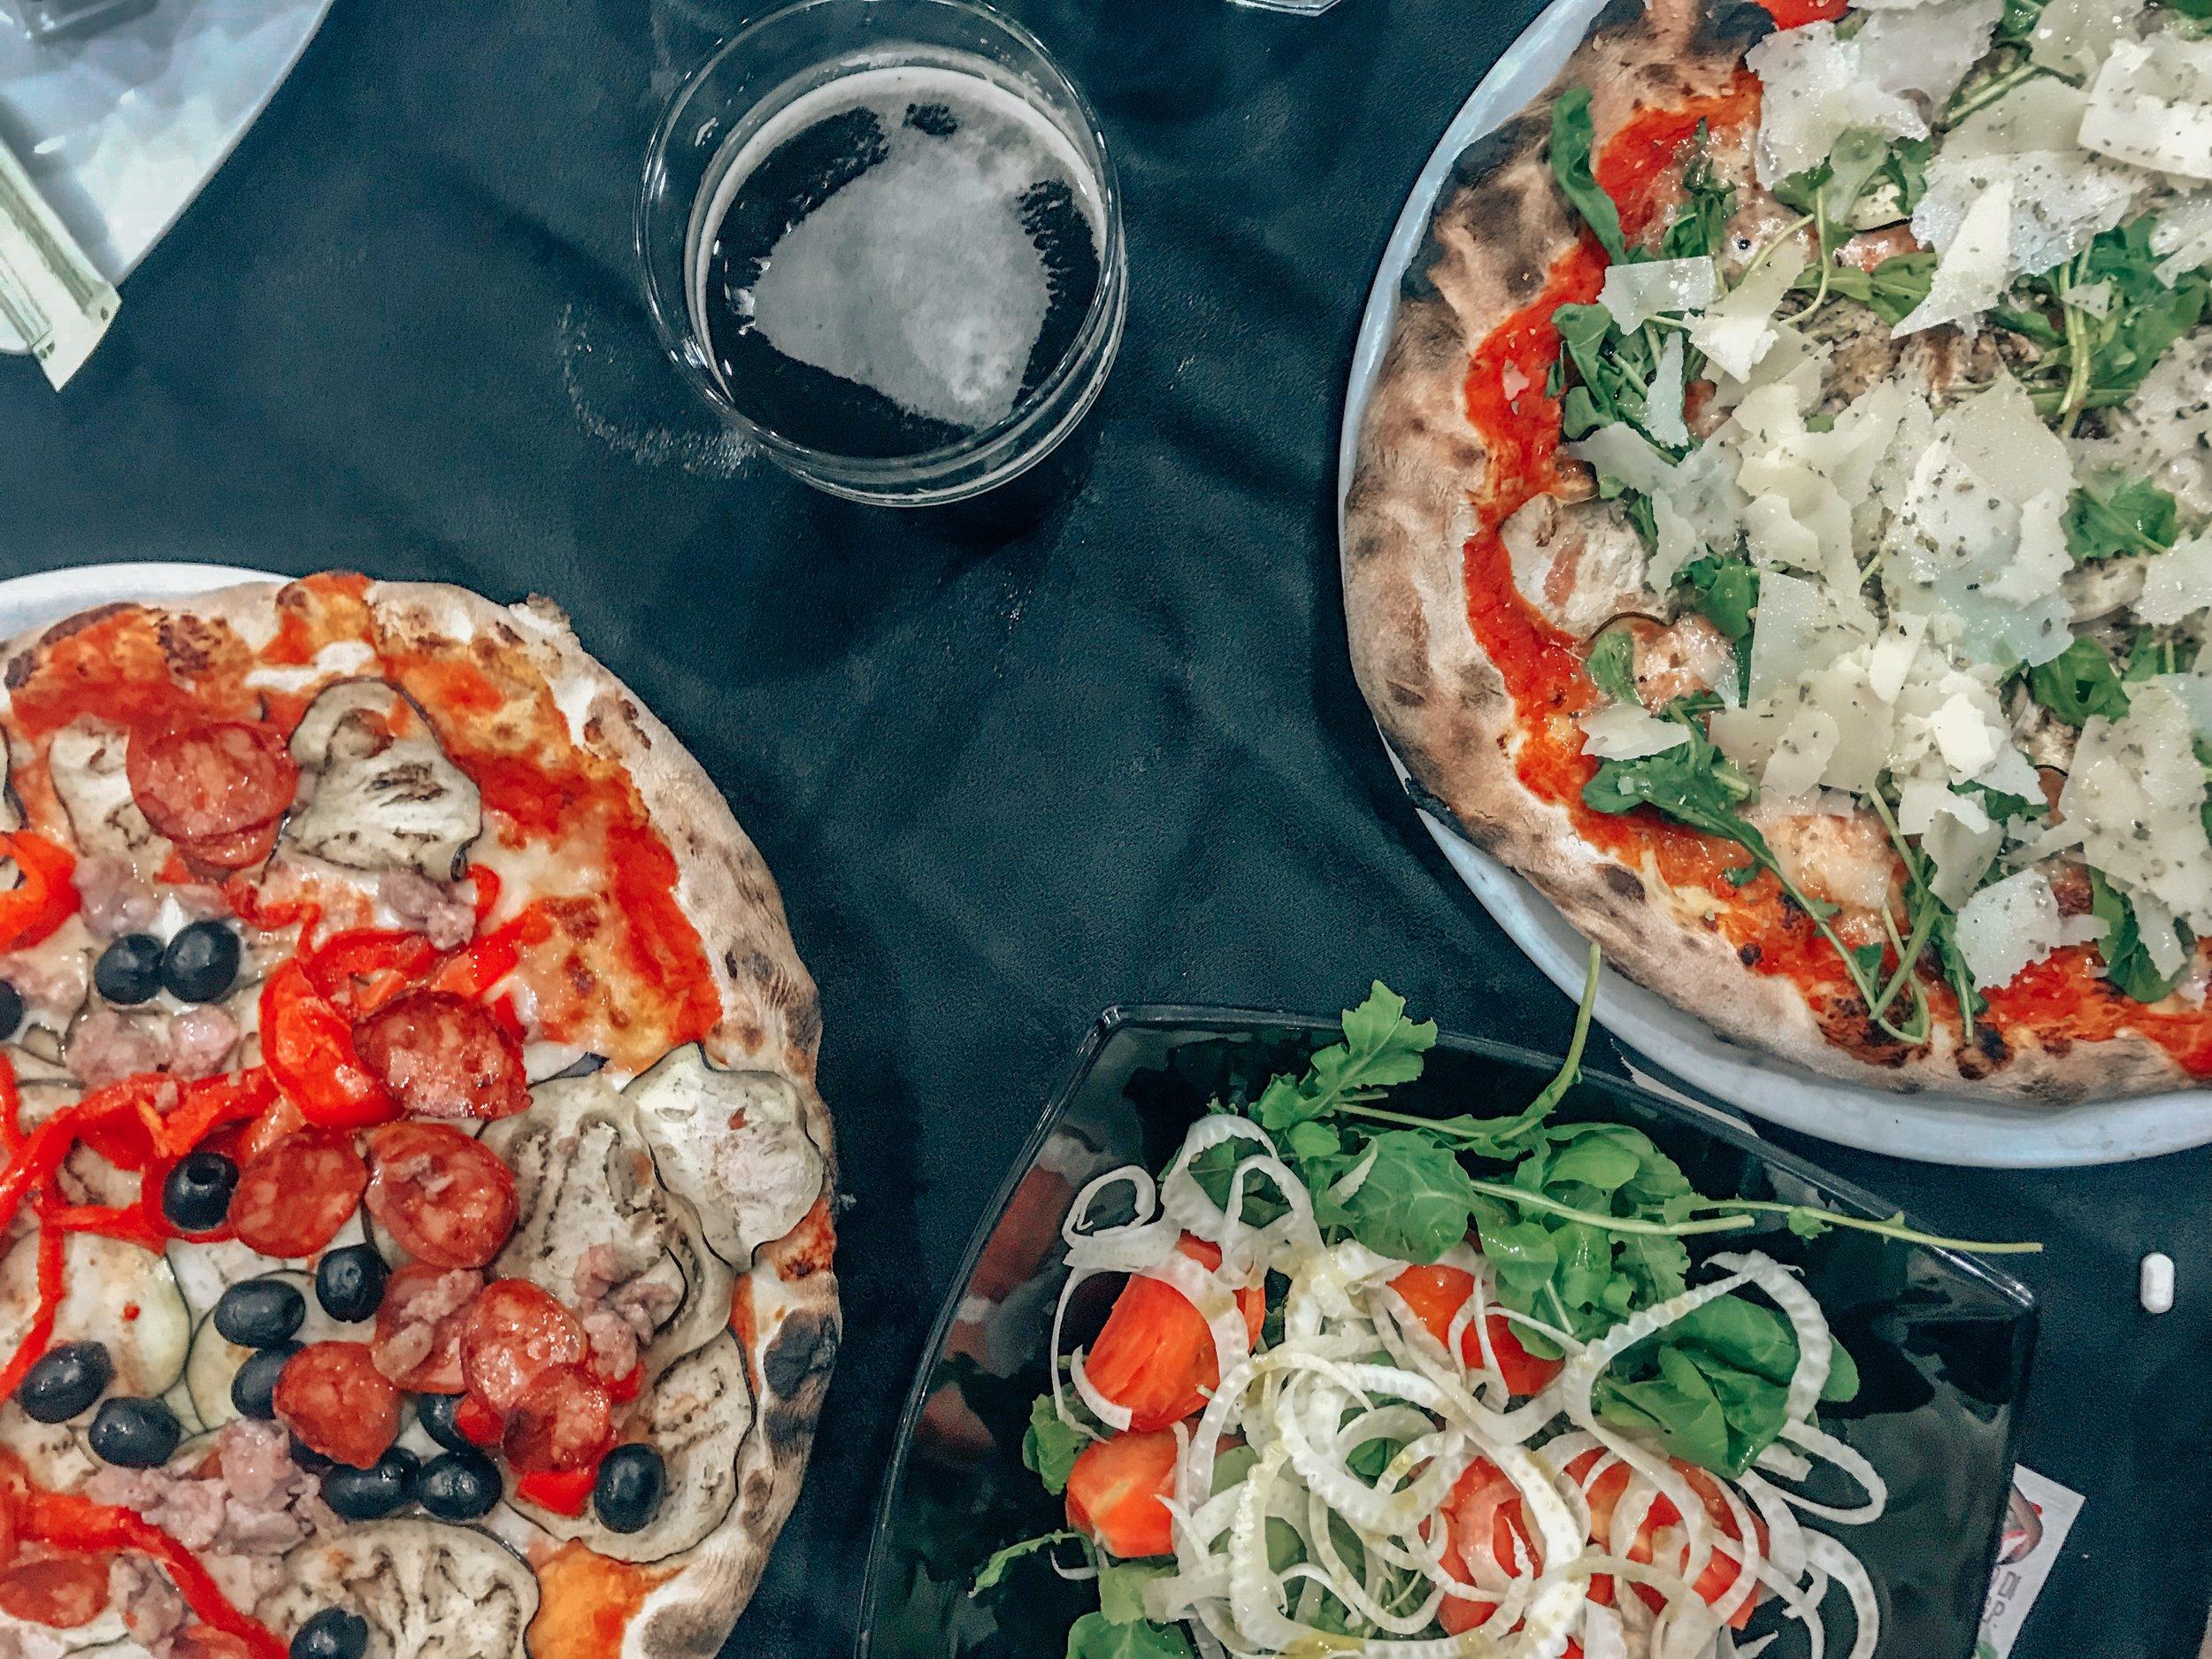 dining on pizza in Sardinia